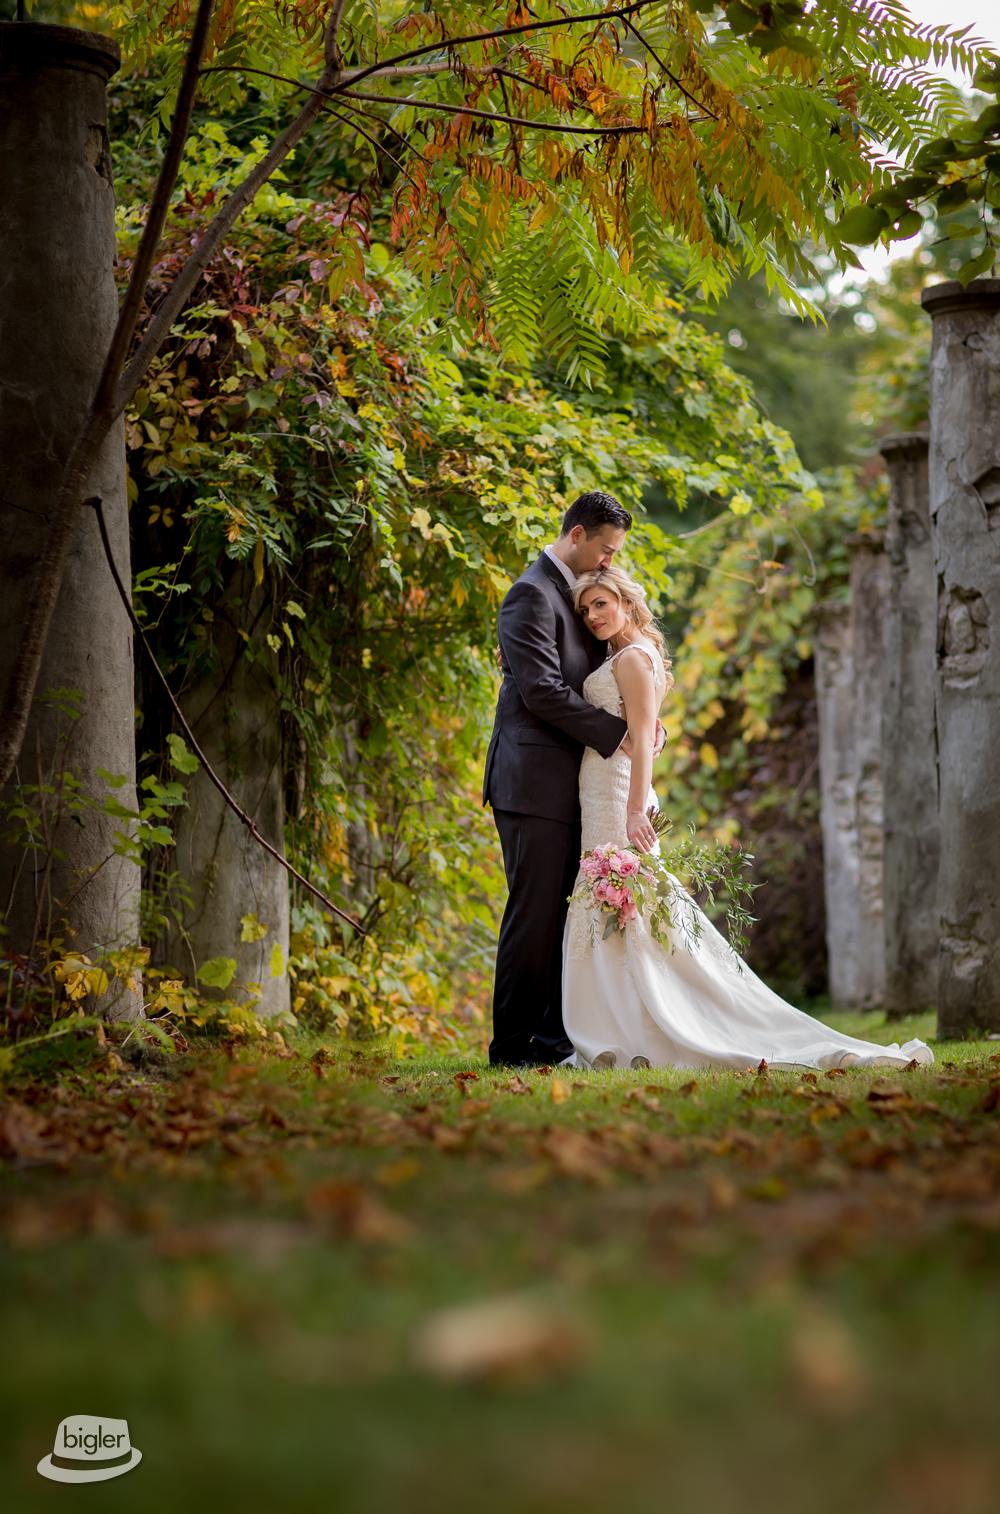 Becca and Lucias Saratoga Lake Wedding Photos  Saratoga Wedding Photography and Videography